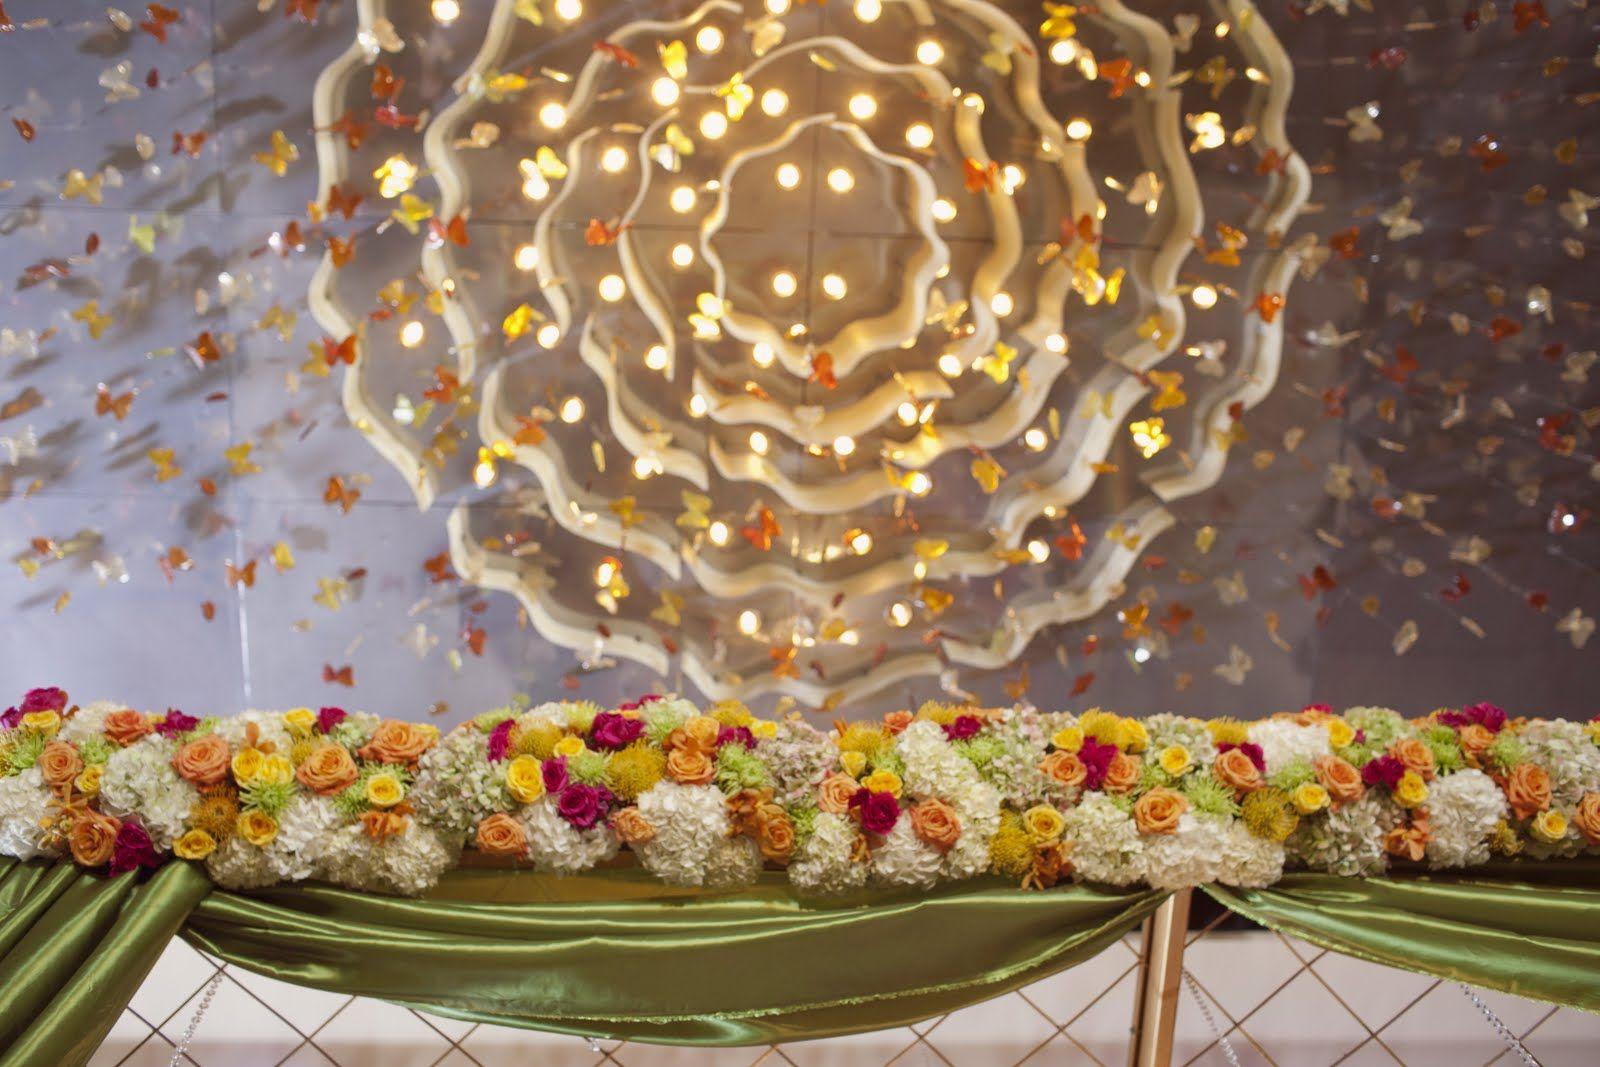 Impressive decoration of the insideceiling of the mandap wedding decor by lotus events decorator daxa patel company lotus events wedding design san francisco bay area ca usa junglespirit Images